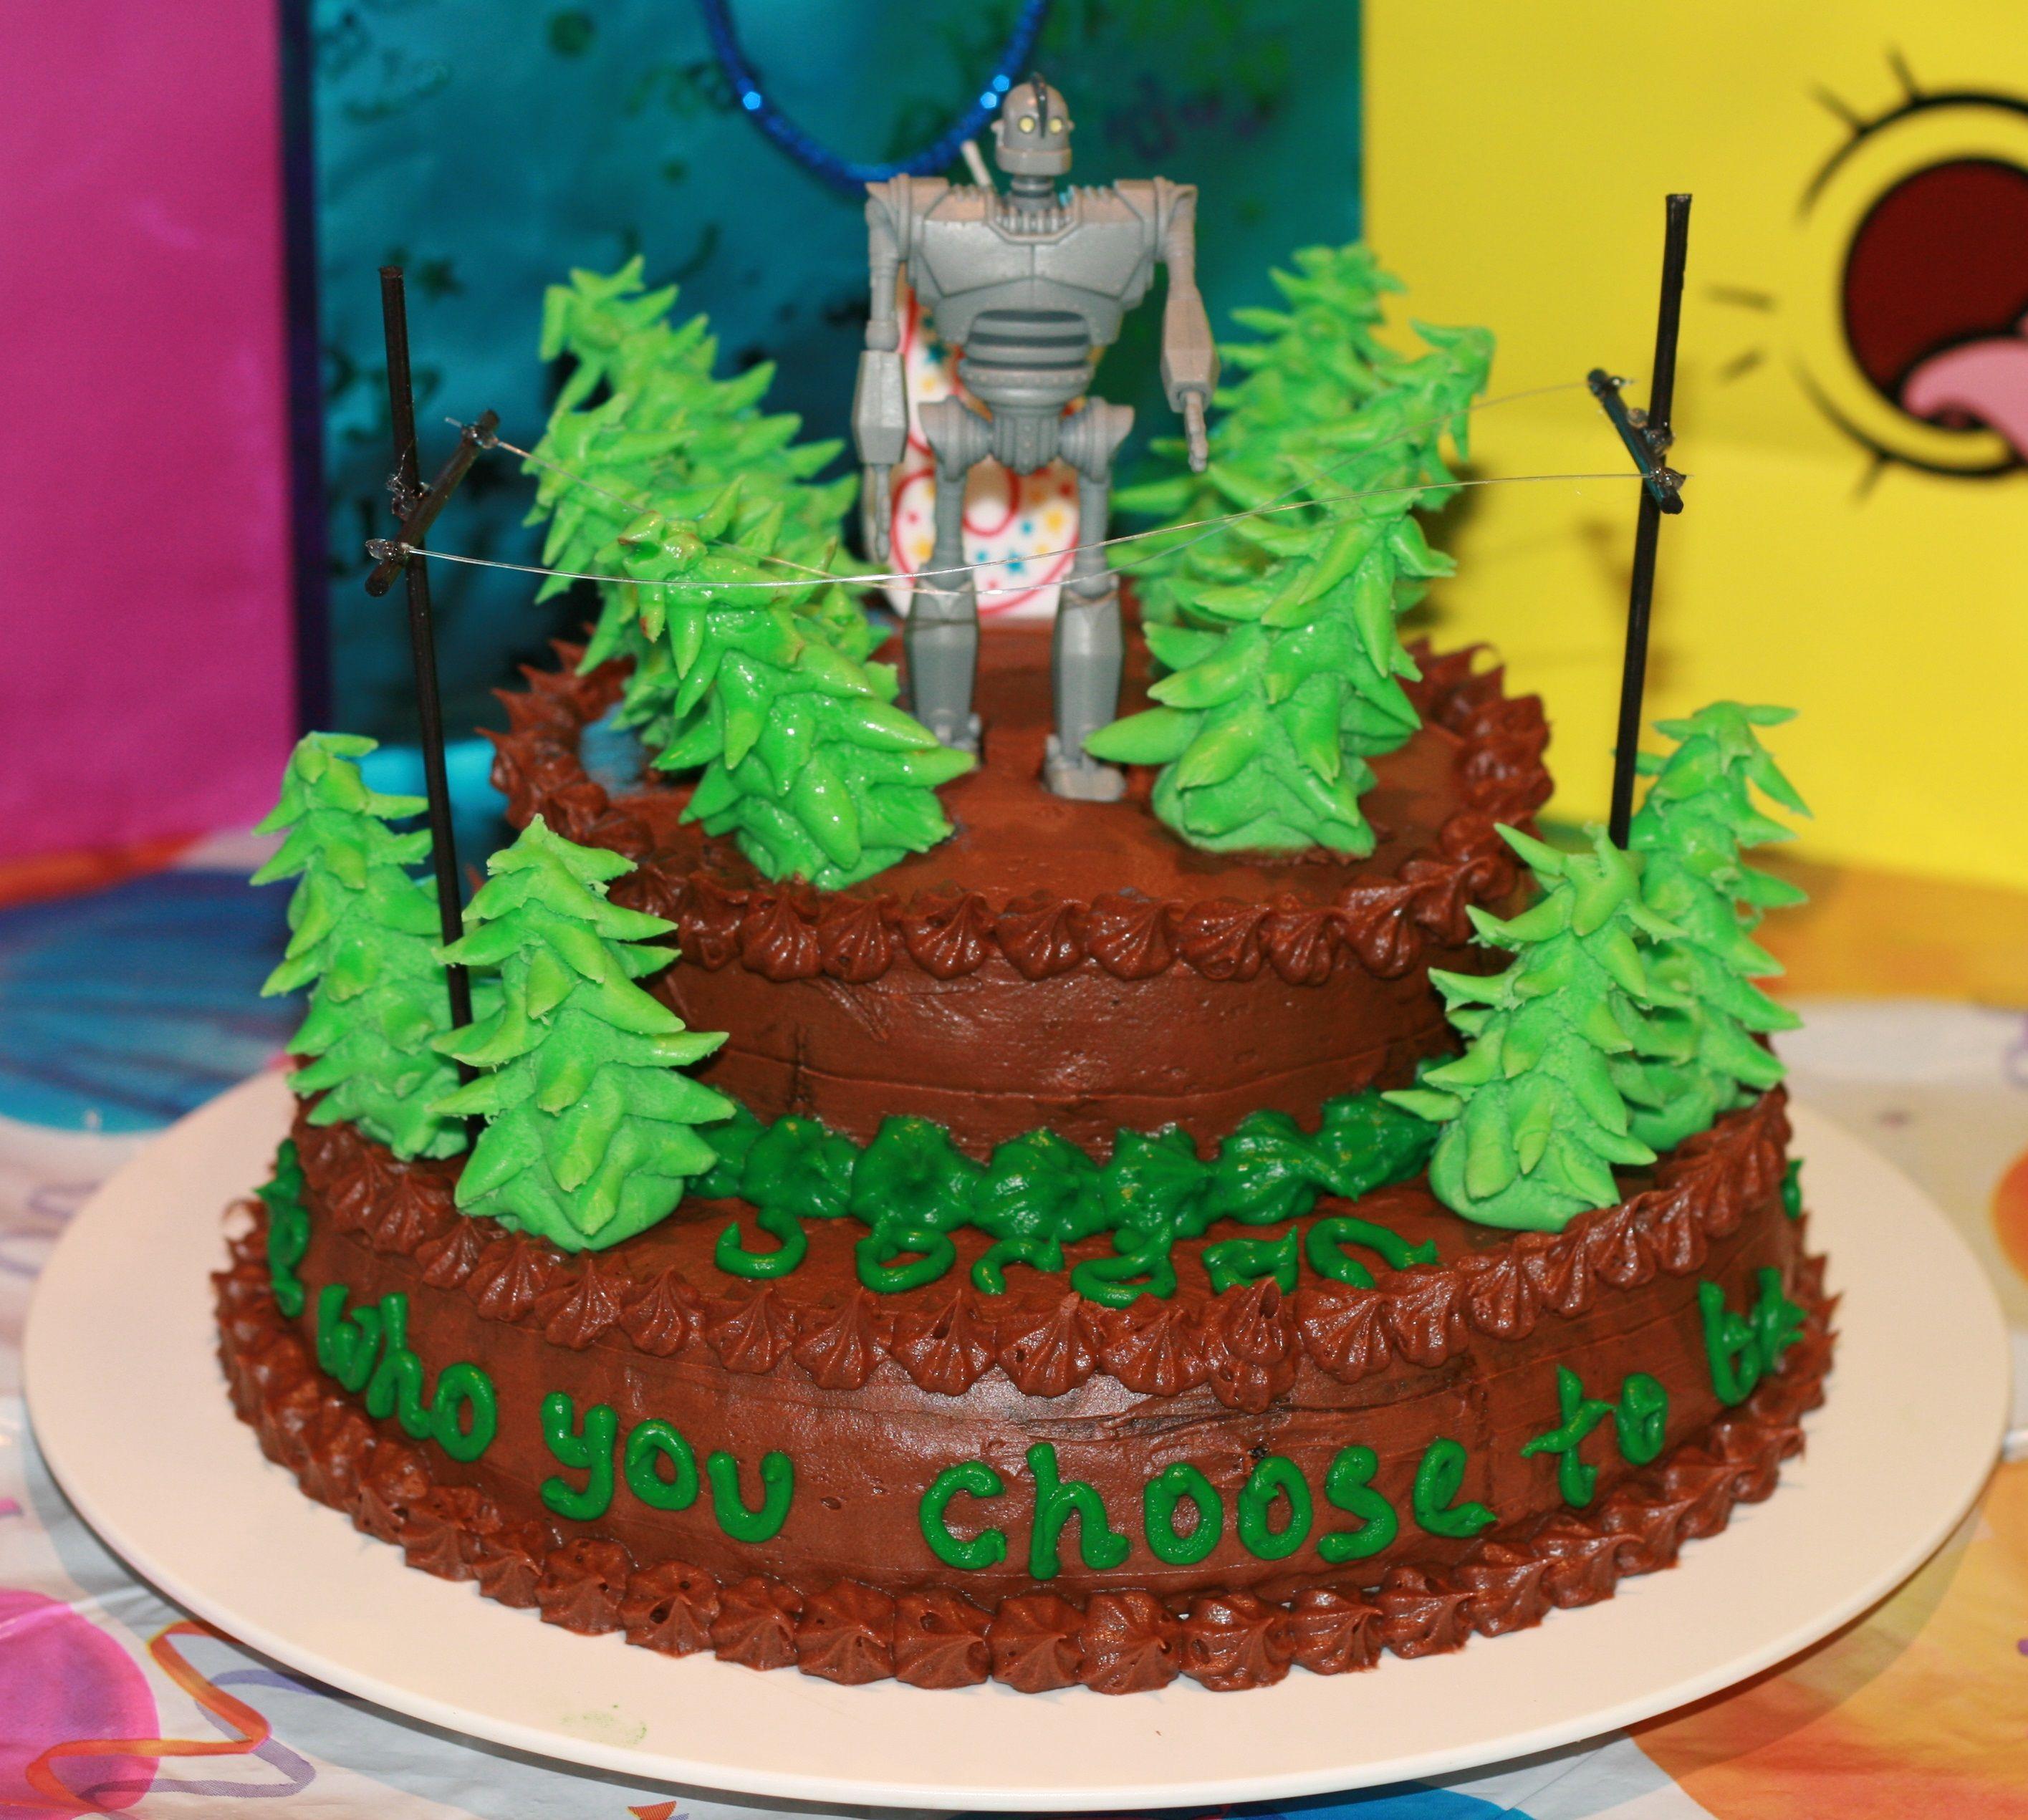 Incredible Iron Giant Cake Giant Cake Third Birthday Party Birthday Parties Personalised Birthday Cards Fashionlily Jamesorg